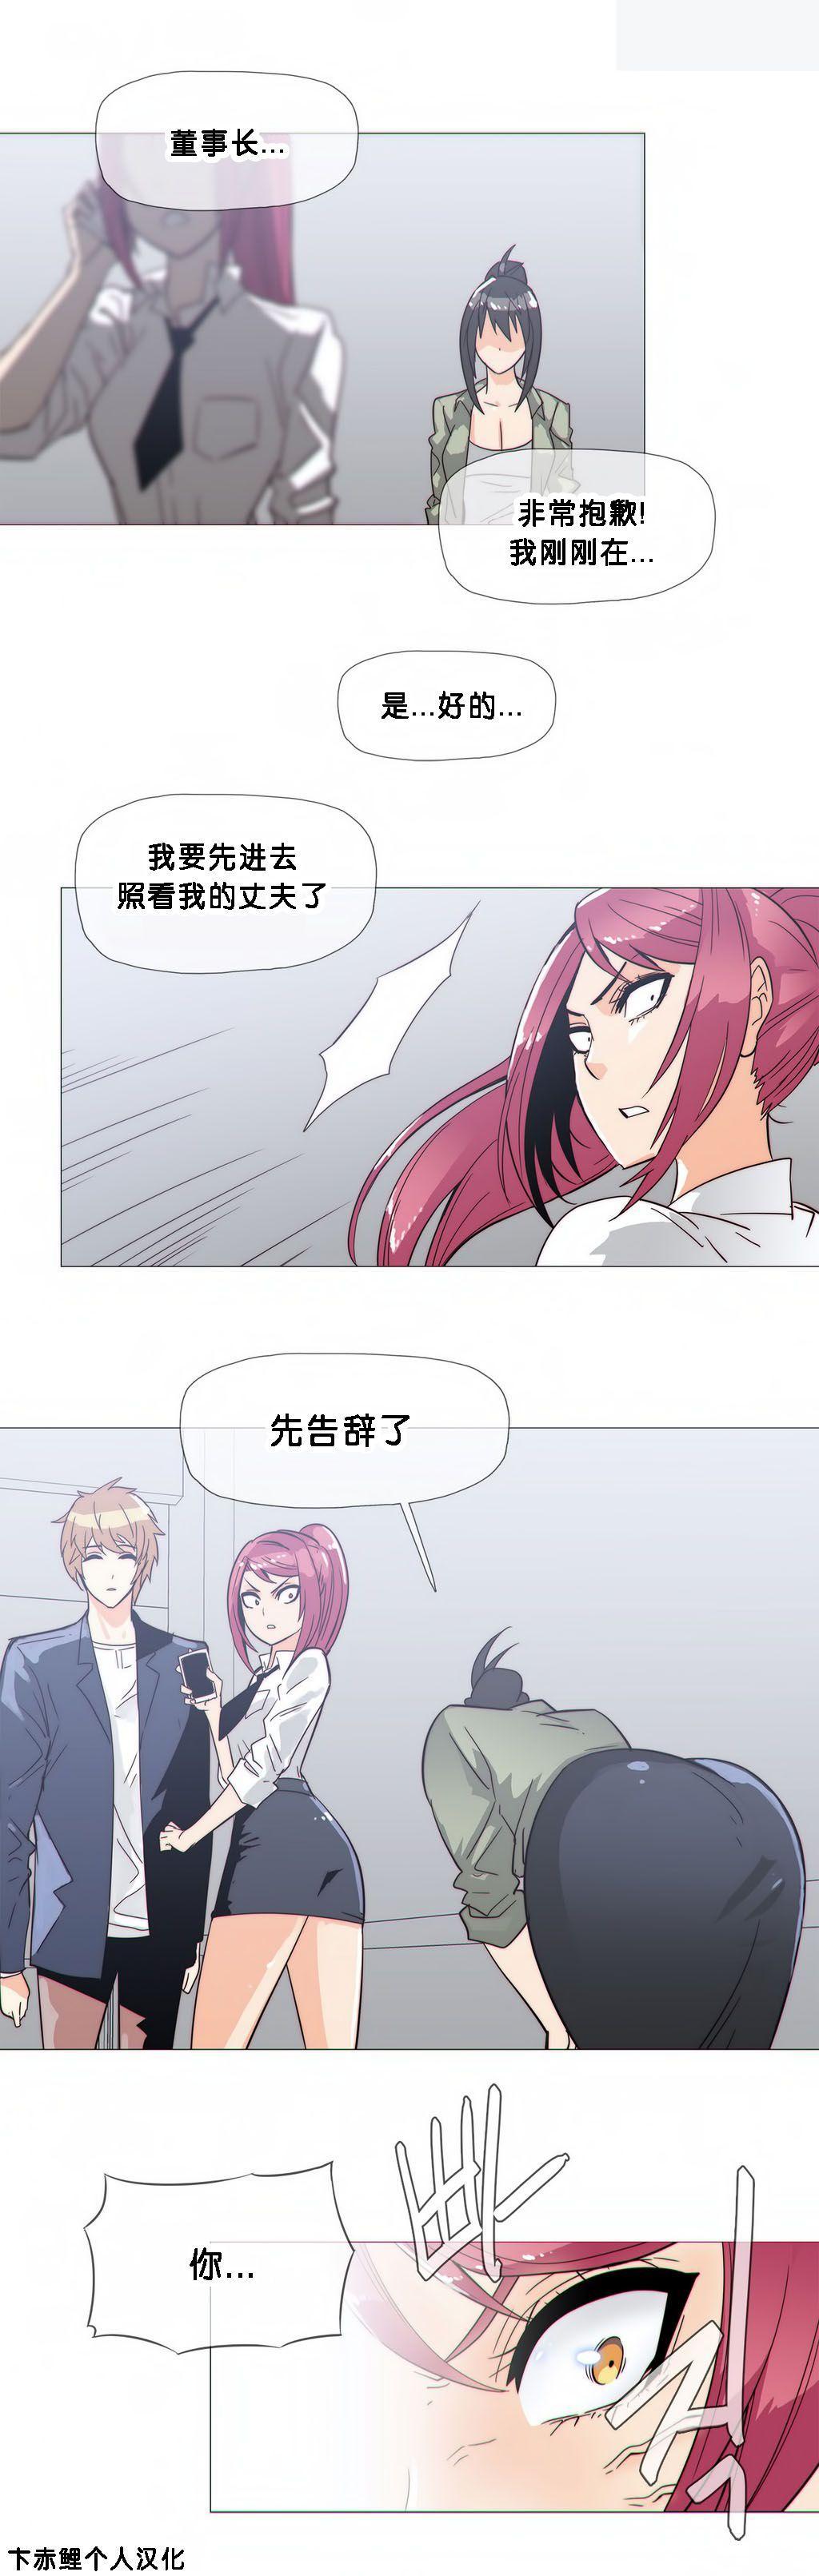 HouseHold Affairs 【卞赤鲤个人汉化】1~33话(持续更新中) 458